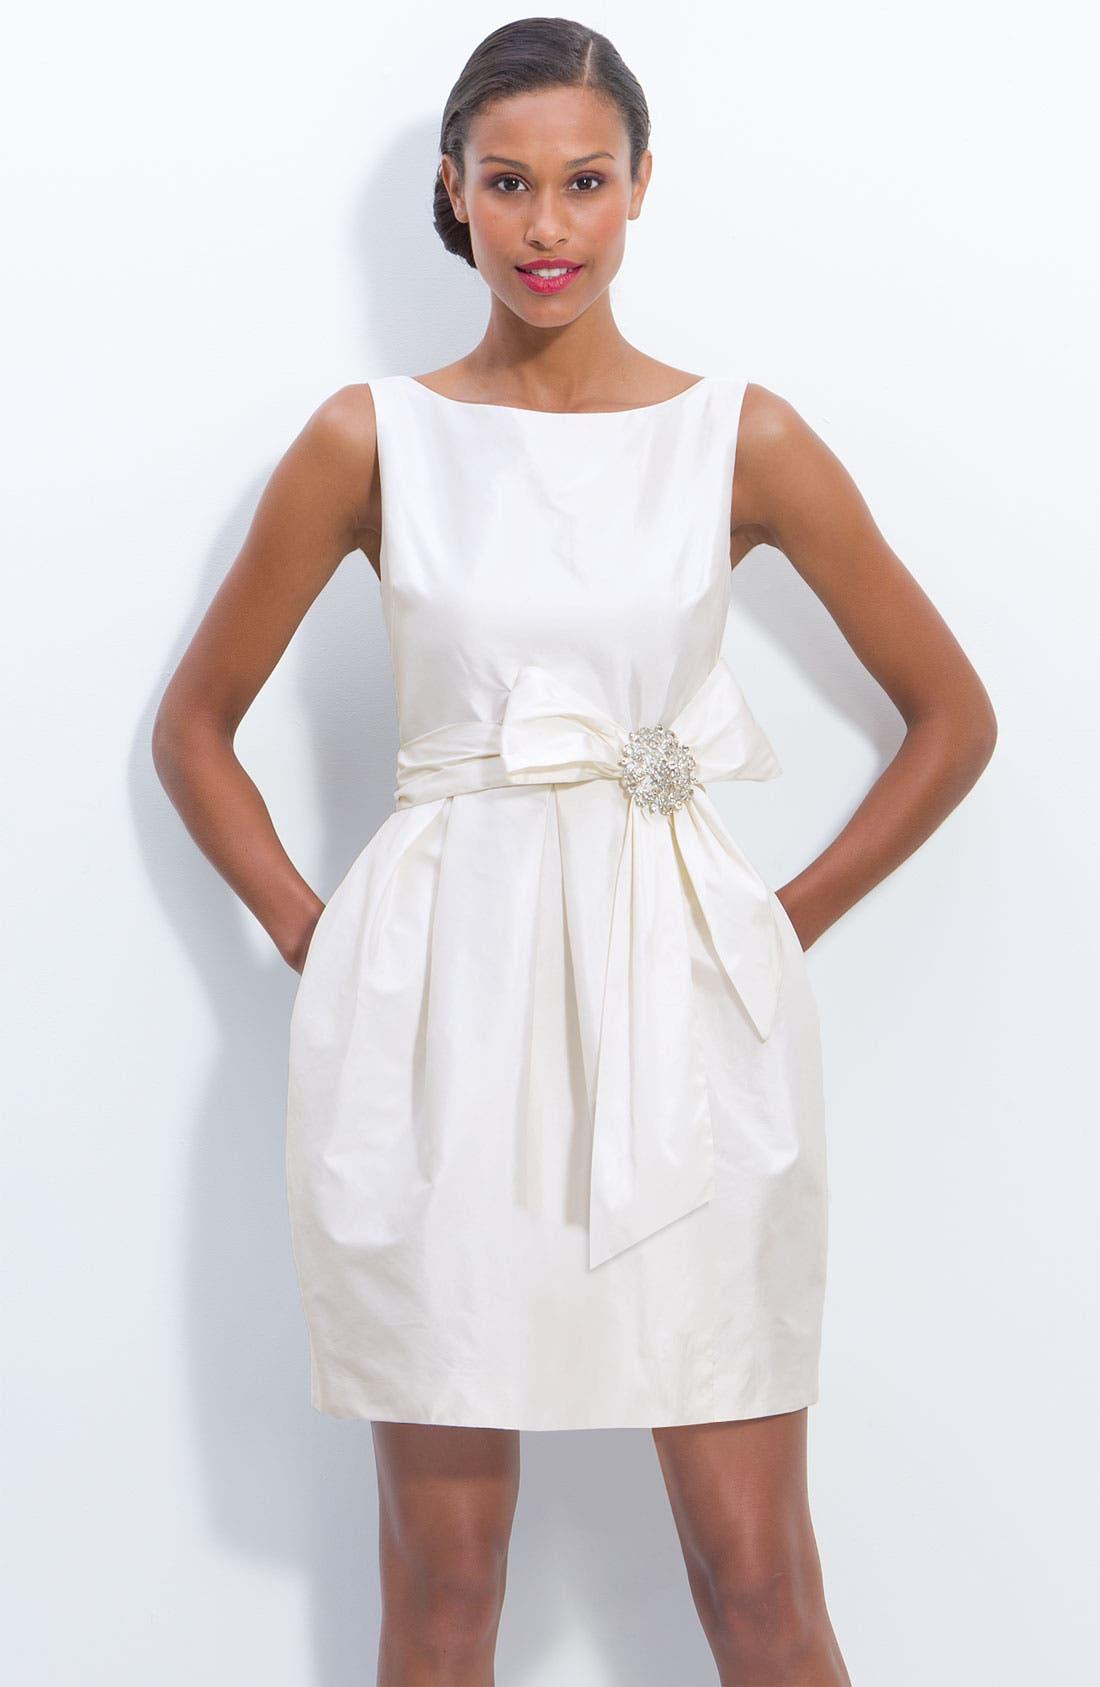 Jeweled Sleeveless Satin Tulip Dress,                             Main thumbnail 1, color,                             900